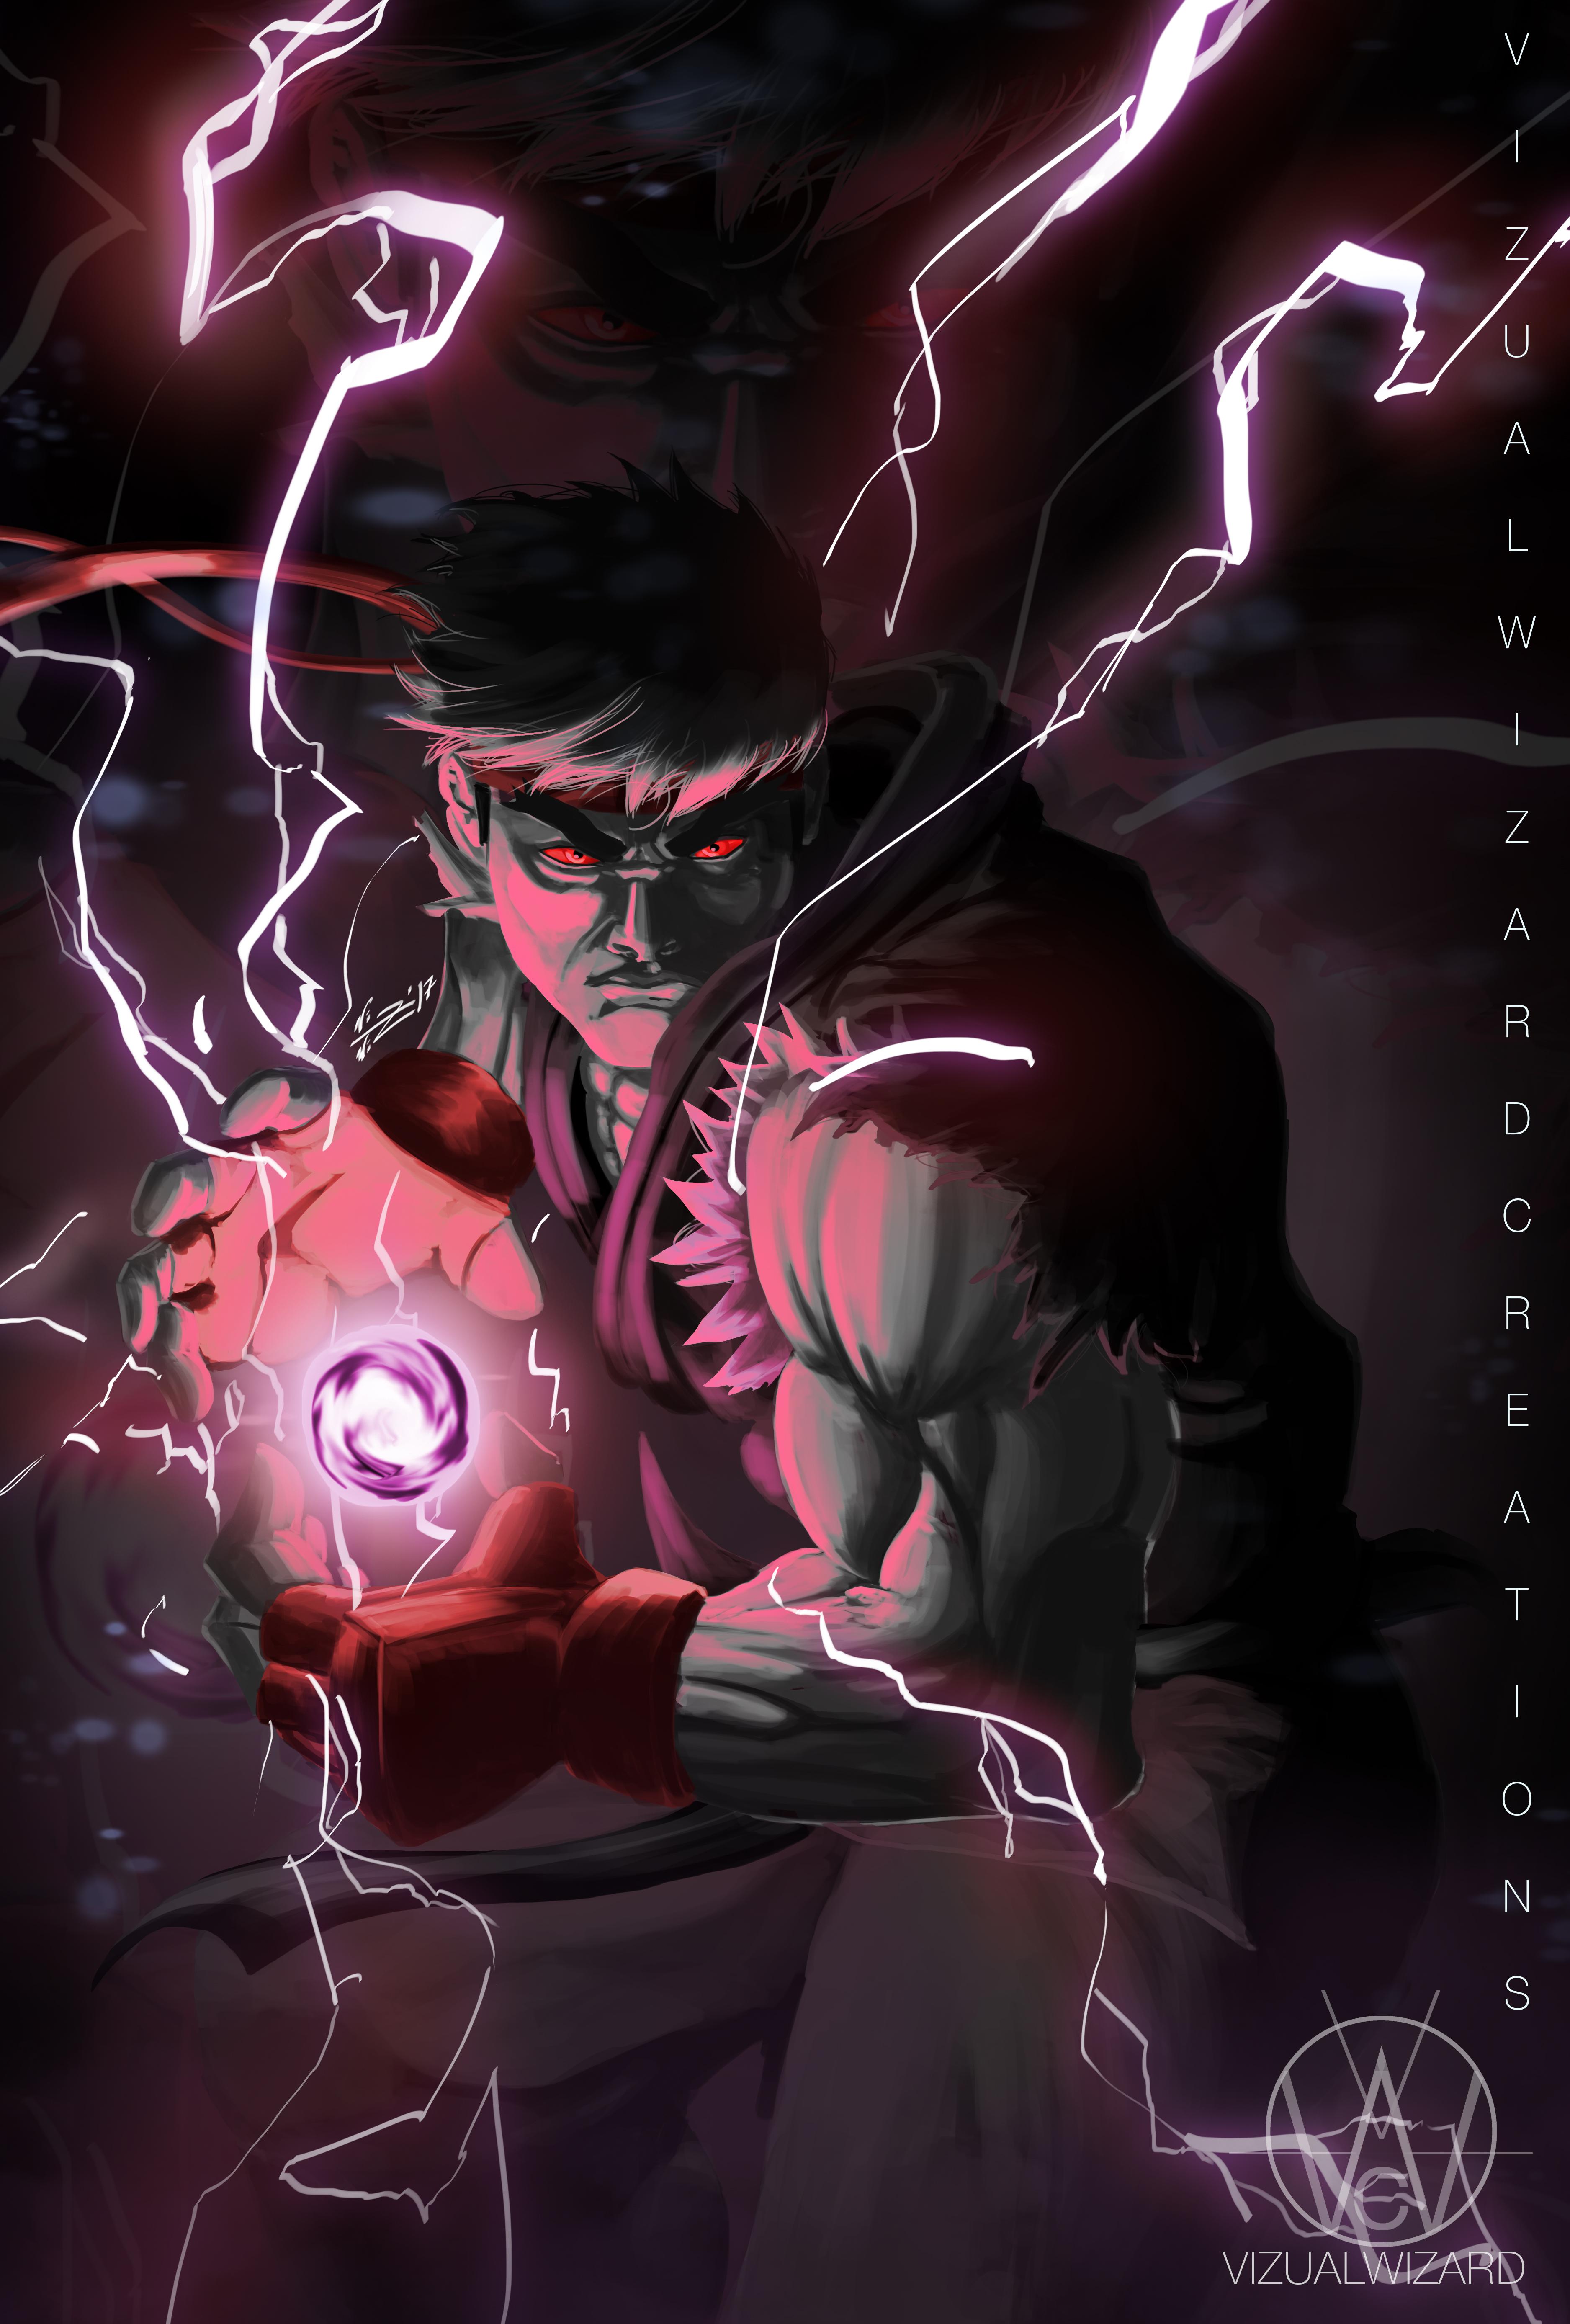 Ryu's Satsui no Hado